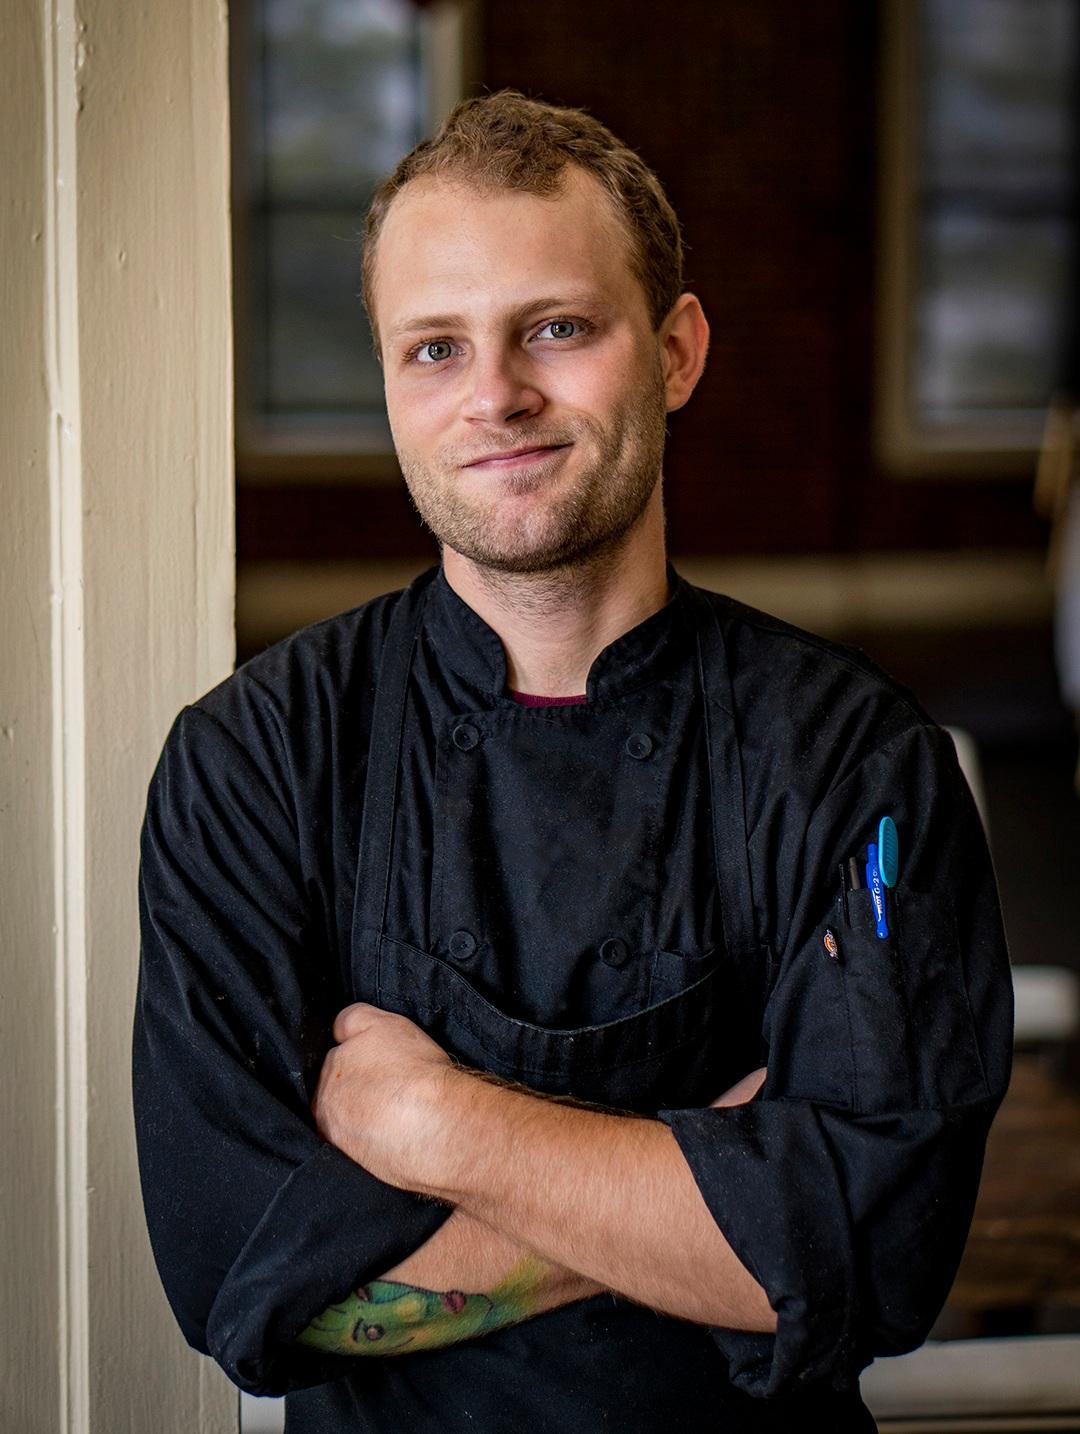 Alex Oehmen  Anju Above Sous Chef  alex@epiphanyfarms.com